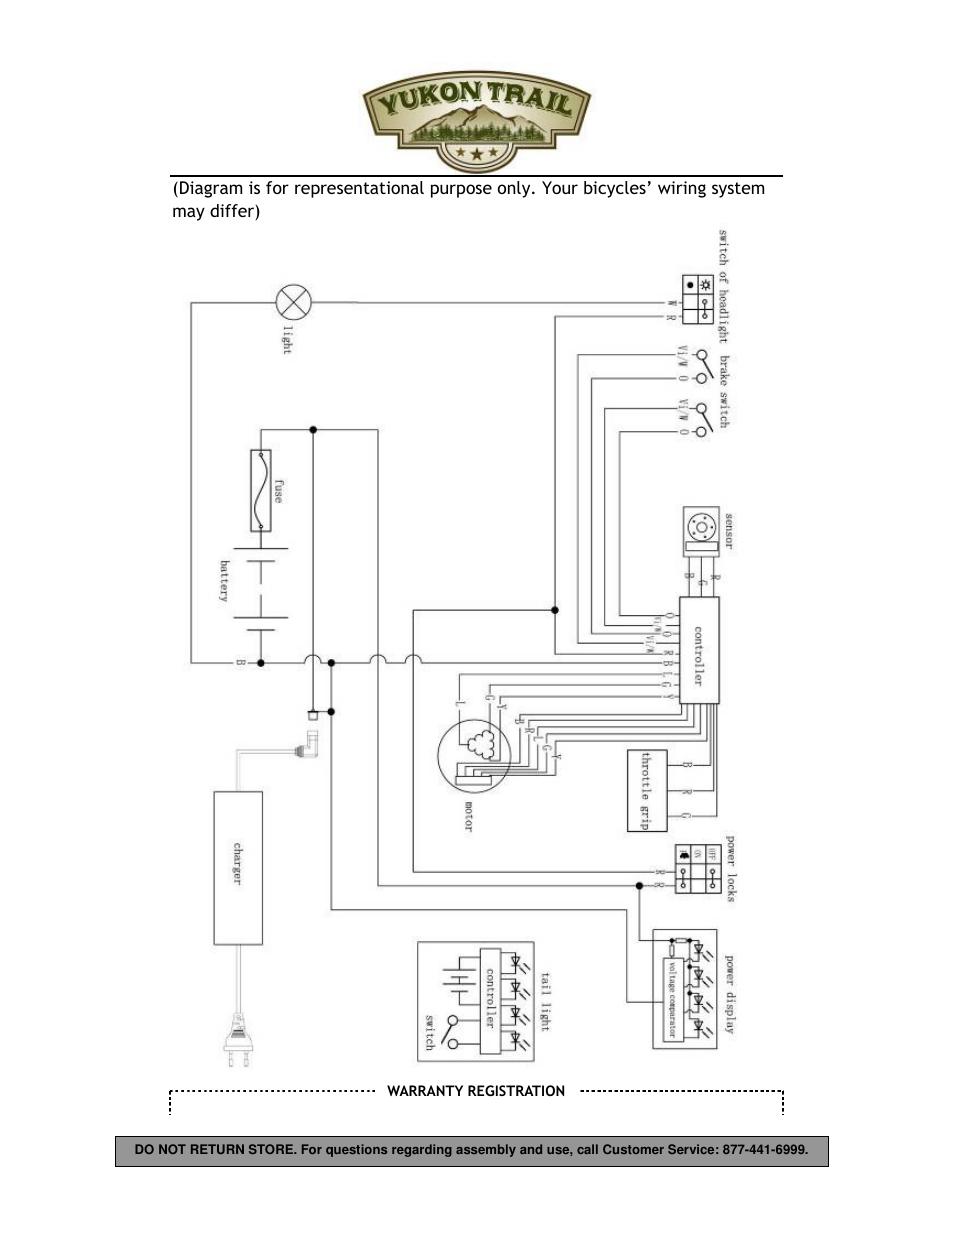 Yukon Trail Dirt Hawk 20 Owners Manual User Manual